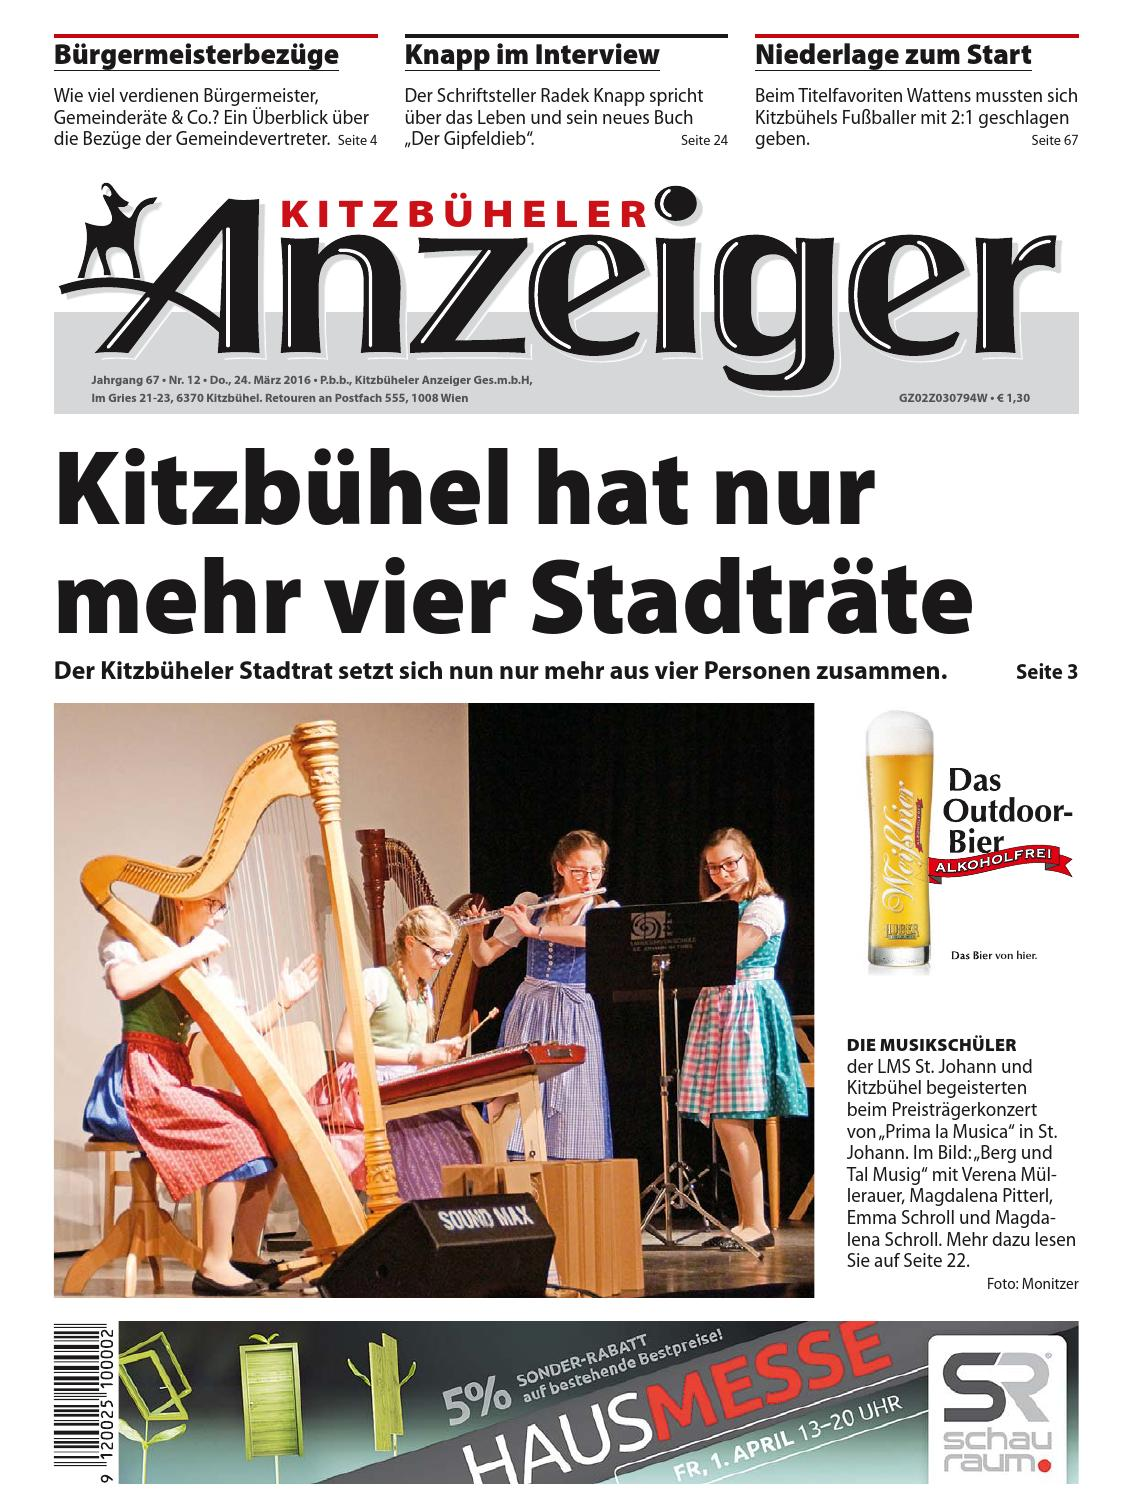 Frauen-Frhstckstreffen in Fieberbrunn - Kitzbhel